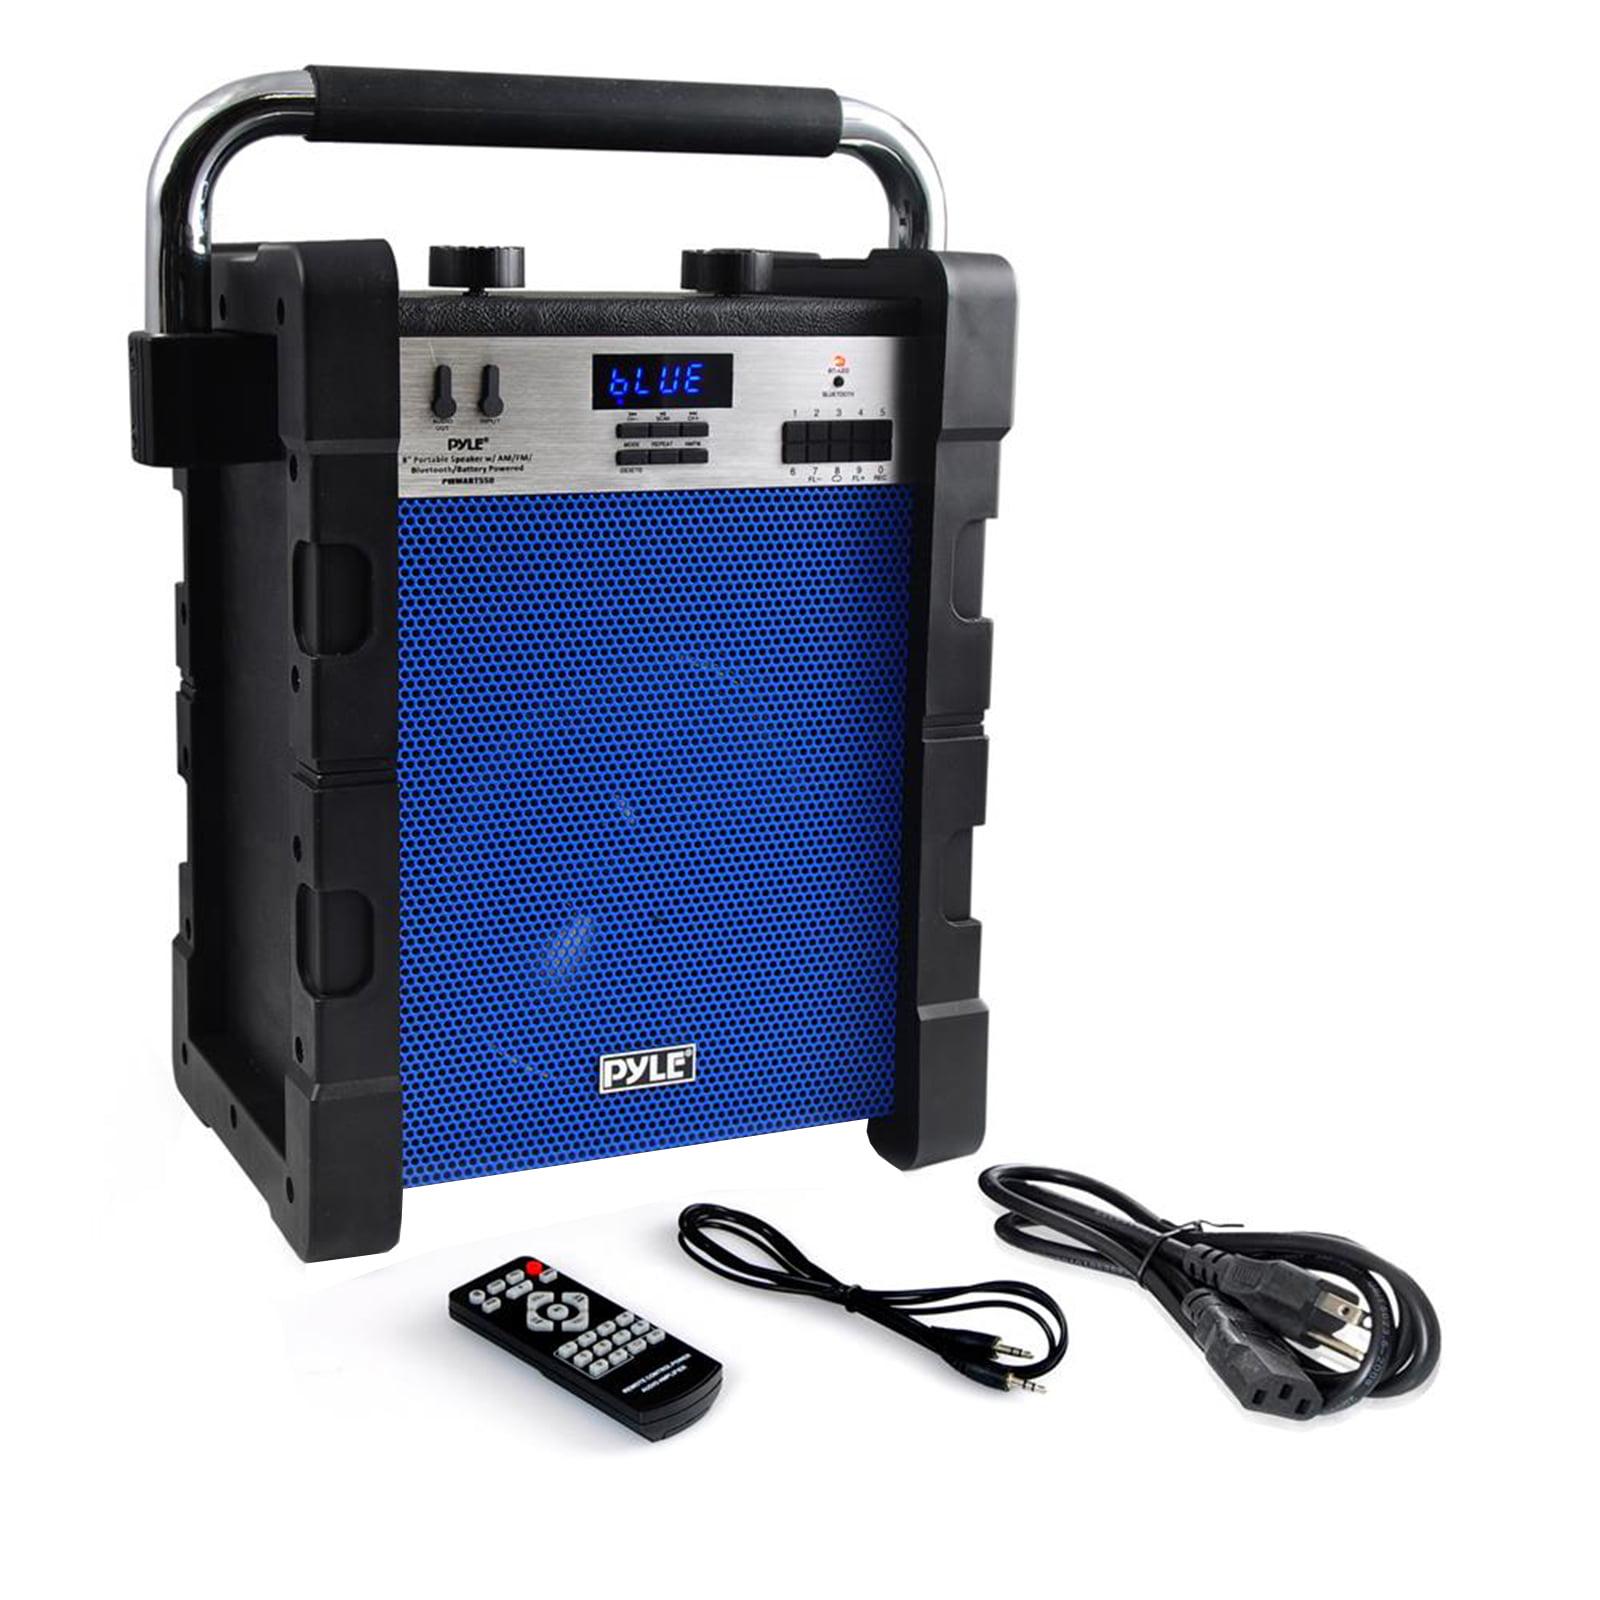 BT Rugged & Portable Speaker System, Work / Job Site Stereo, Built-in Battery, MP3/USB/SD, AM/FM Radio (Blue)